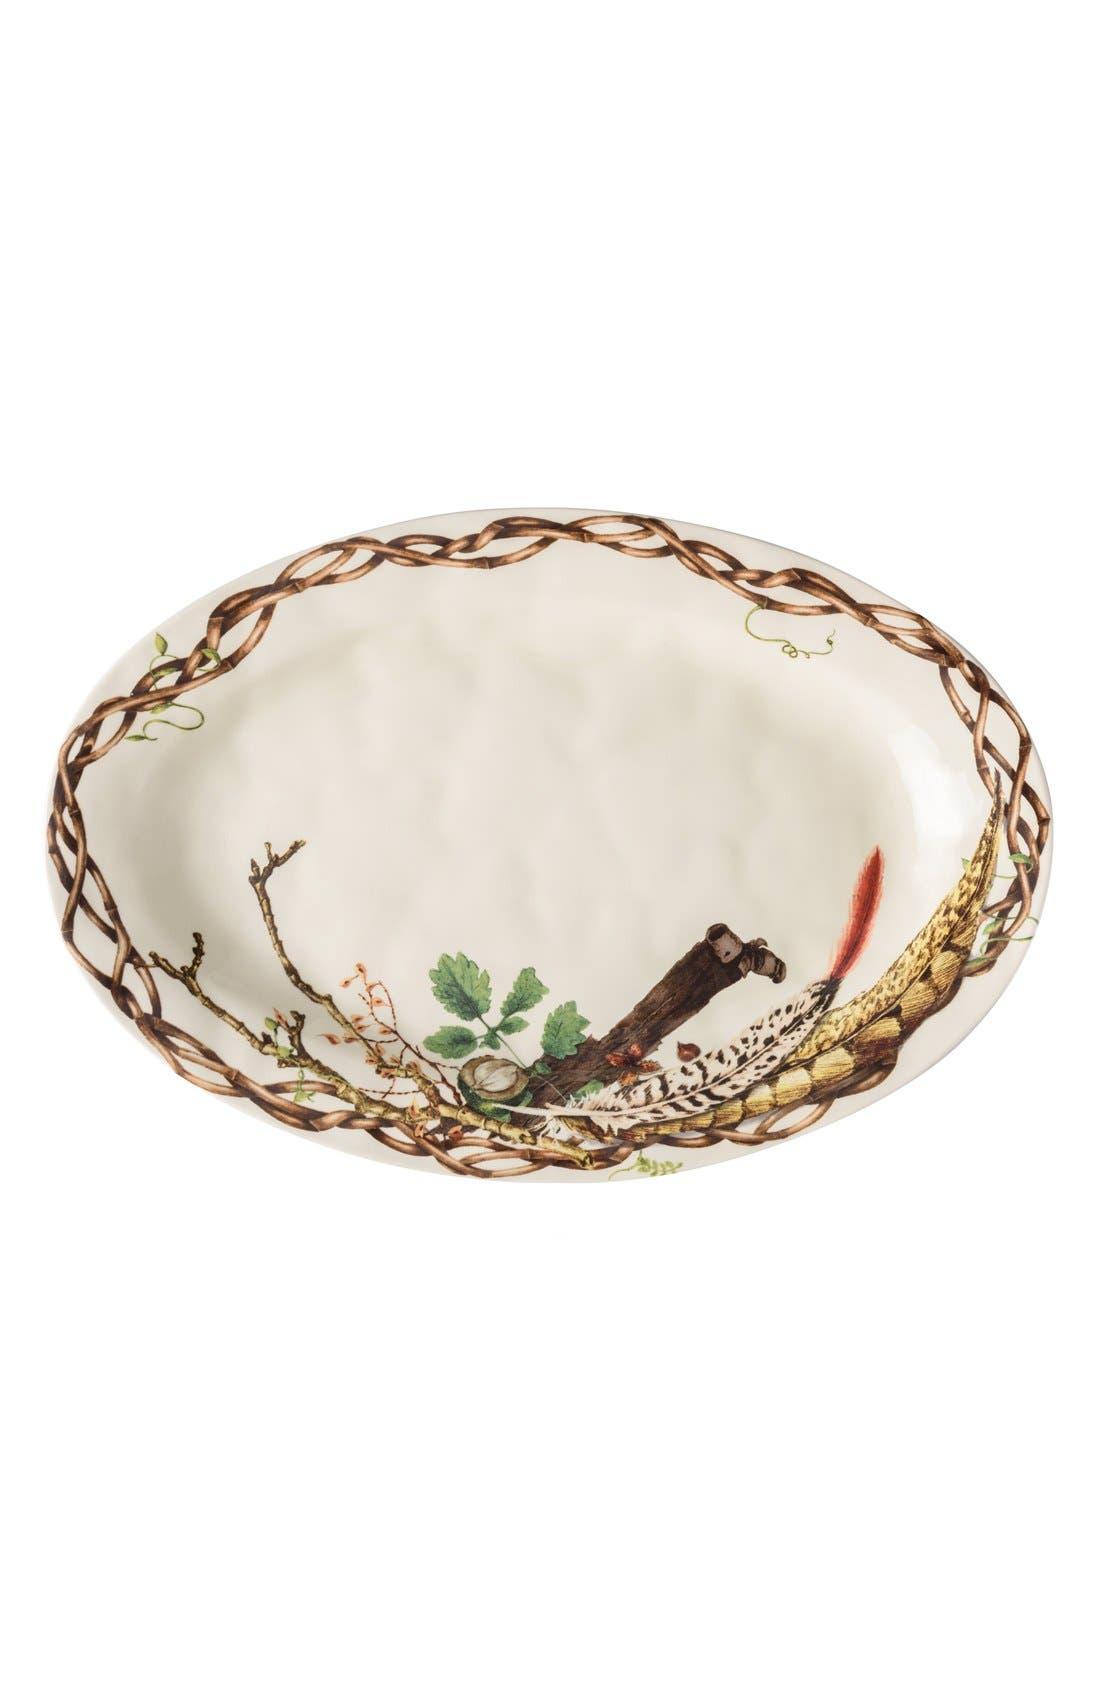 Main Image - Juliska Forest Walk Oval Ceramic Platter